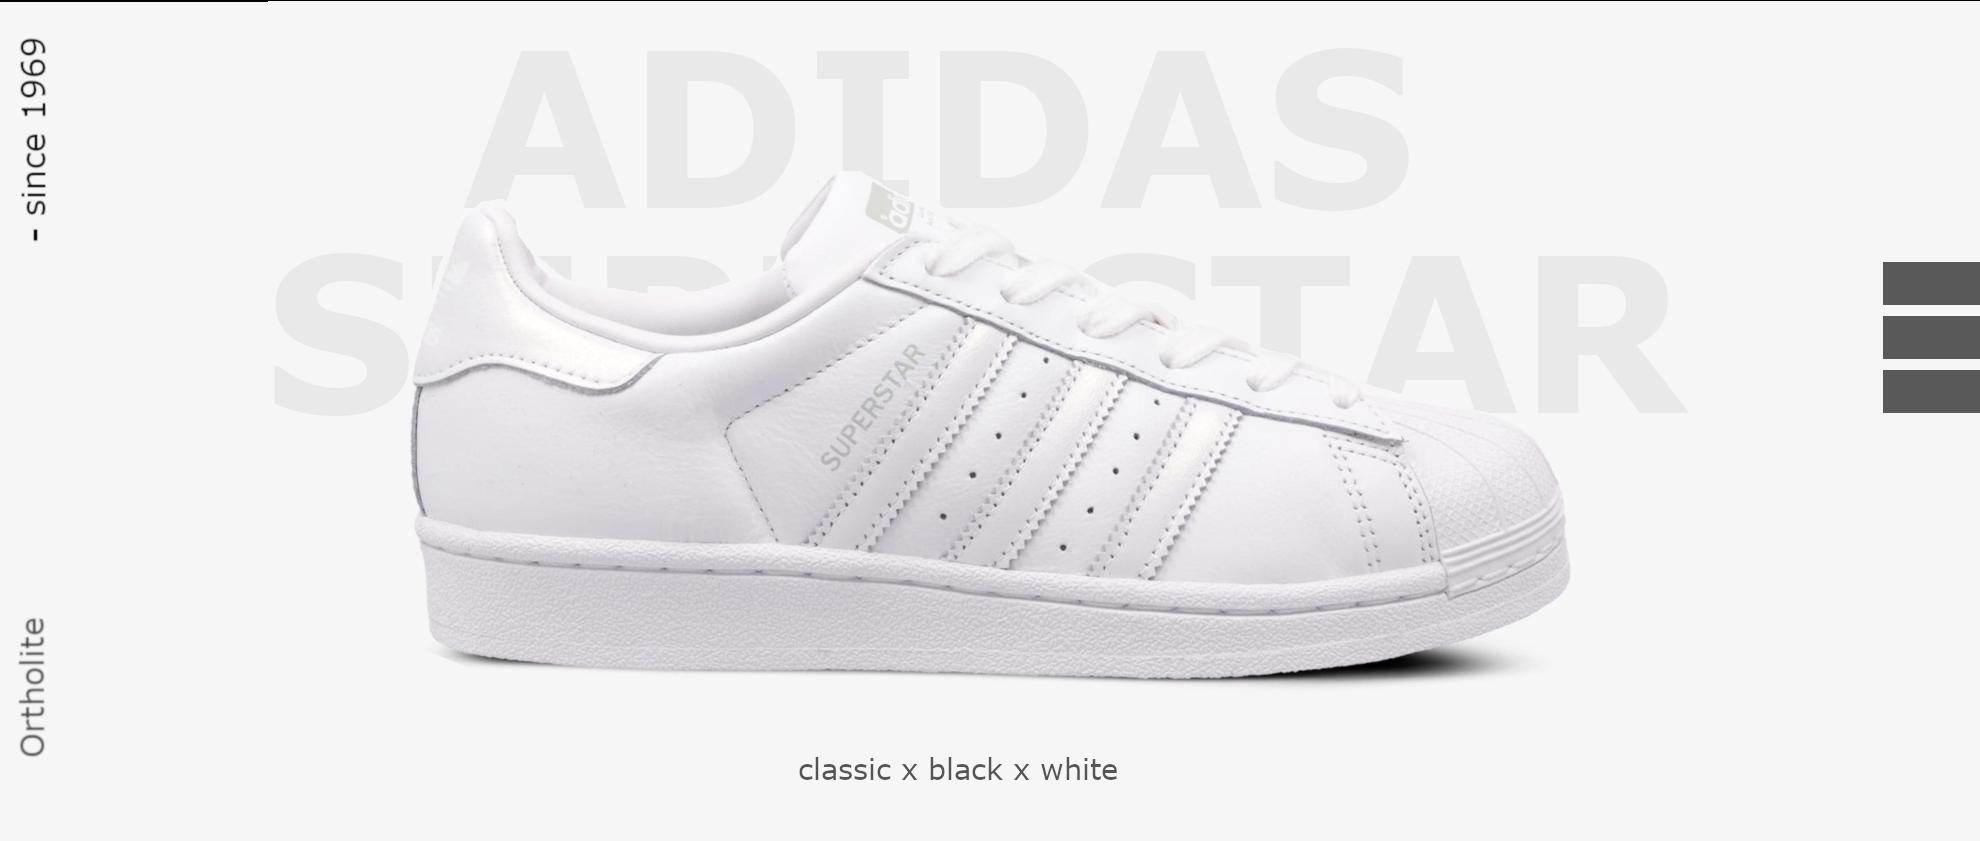 Trendy – Sneakersy adidas Superstar najnowsze Superstary